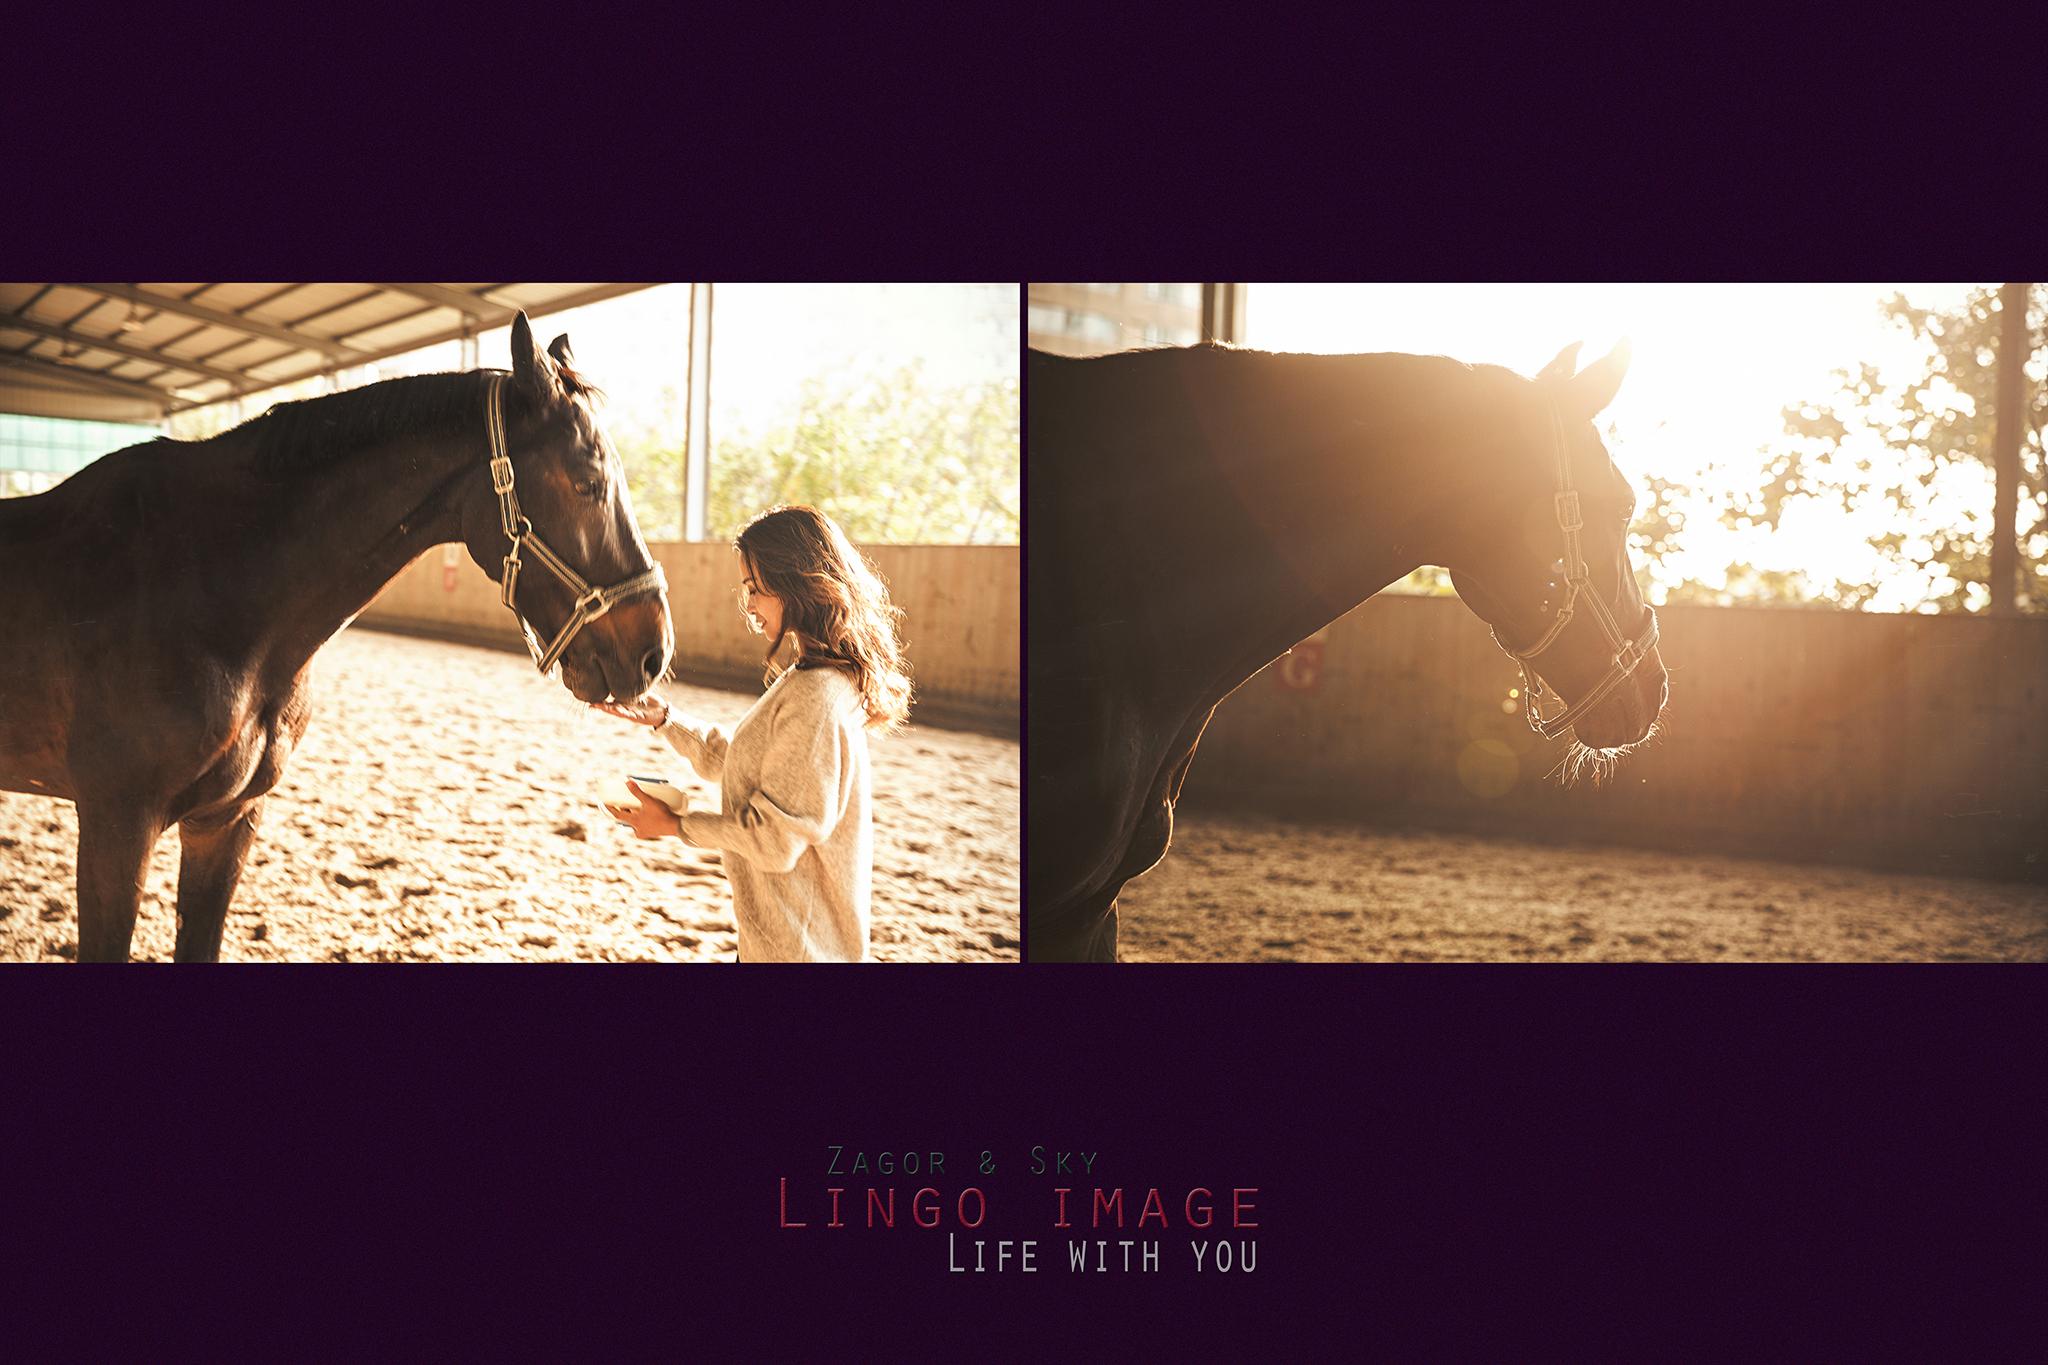 Lingo image_寵物50